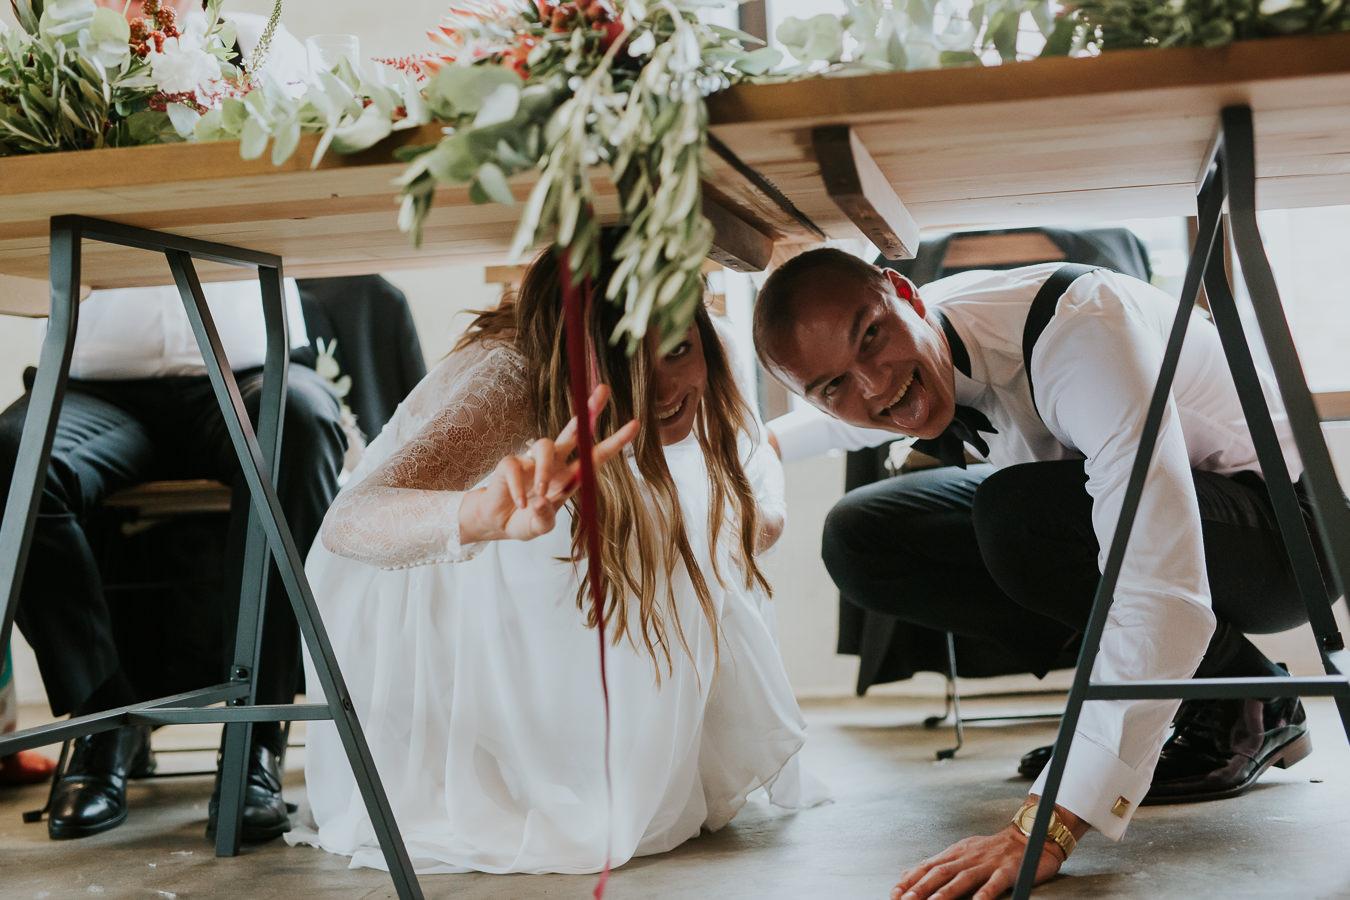 Bryllup-Lageret-Tofte-bryllupsfotograf-172.jpg